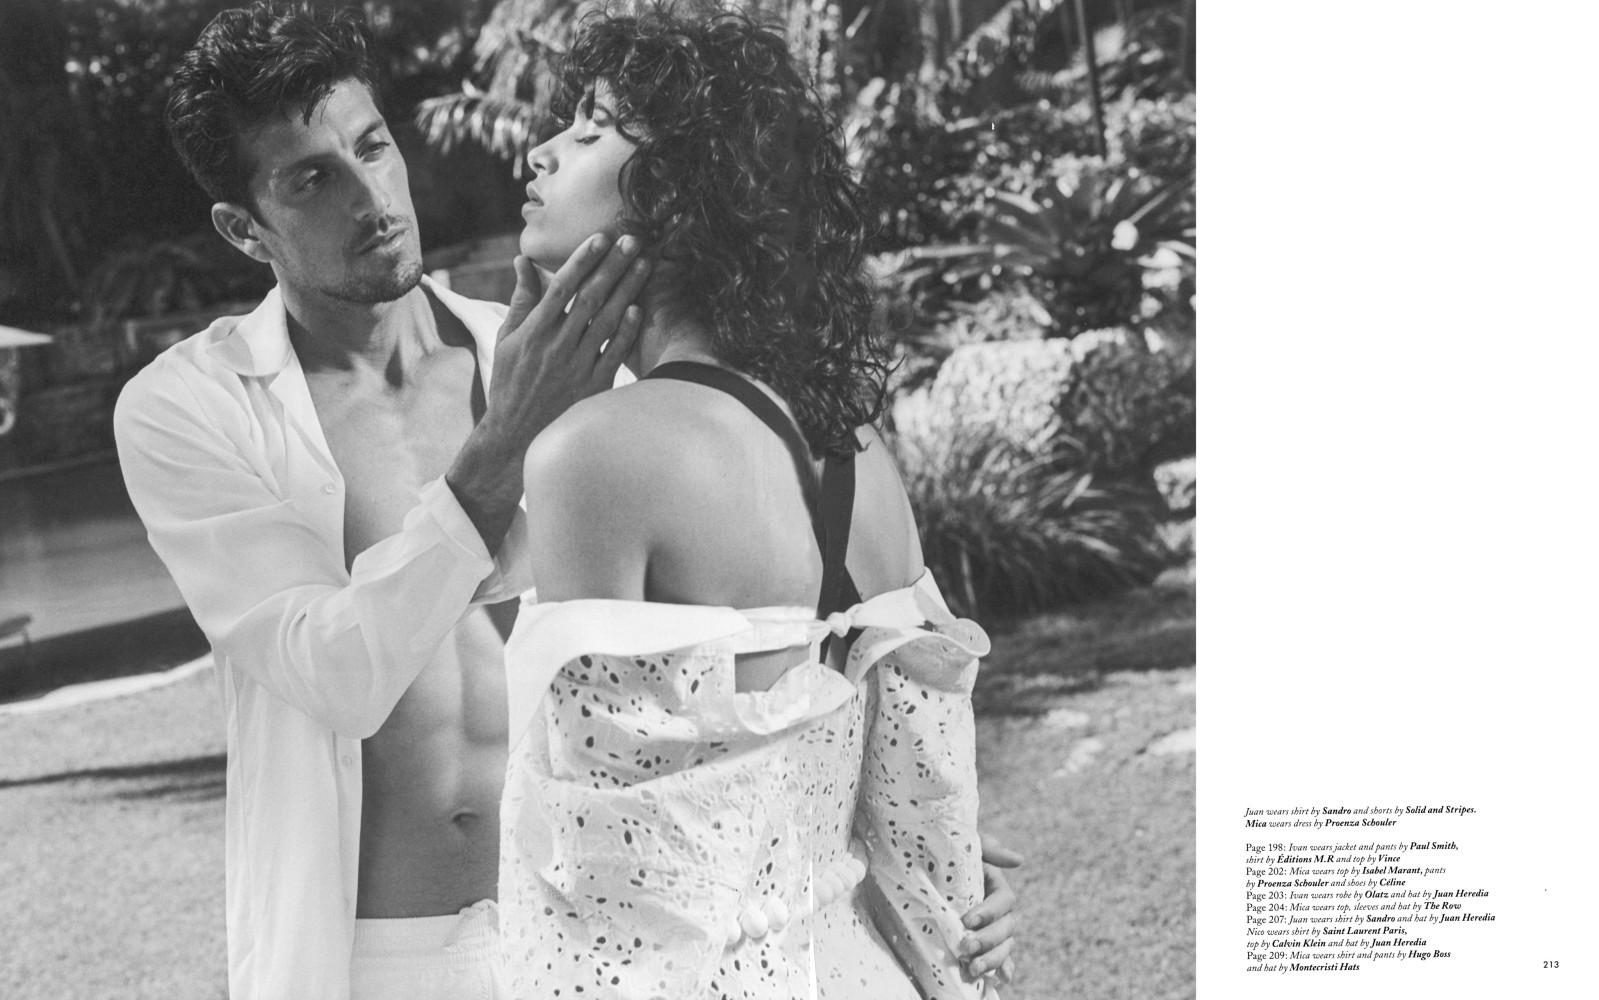 Ivan de Pineda for HOLIDAY magazine